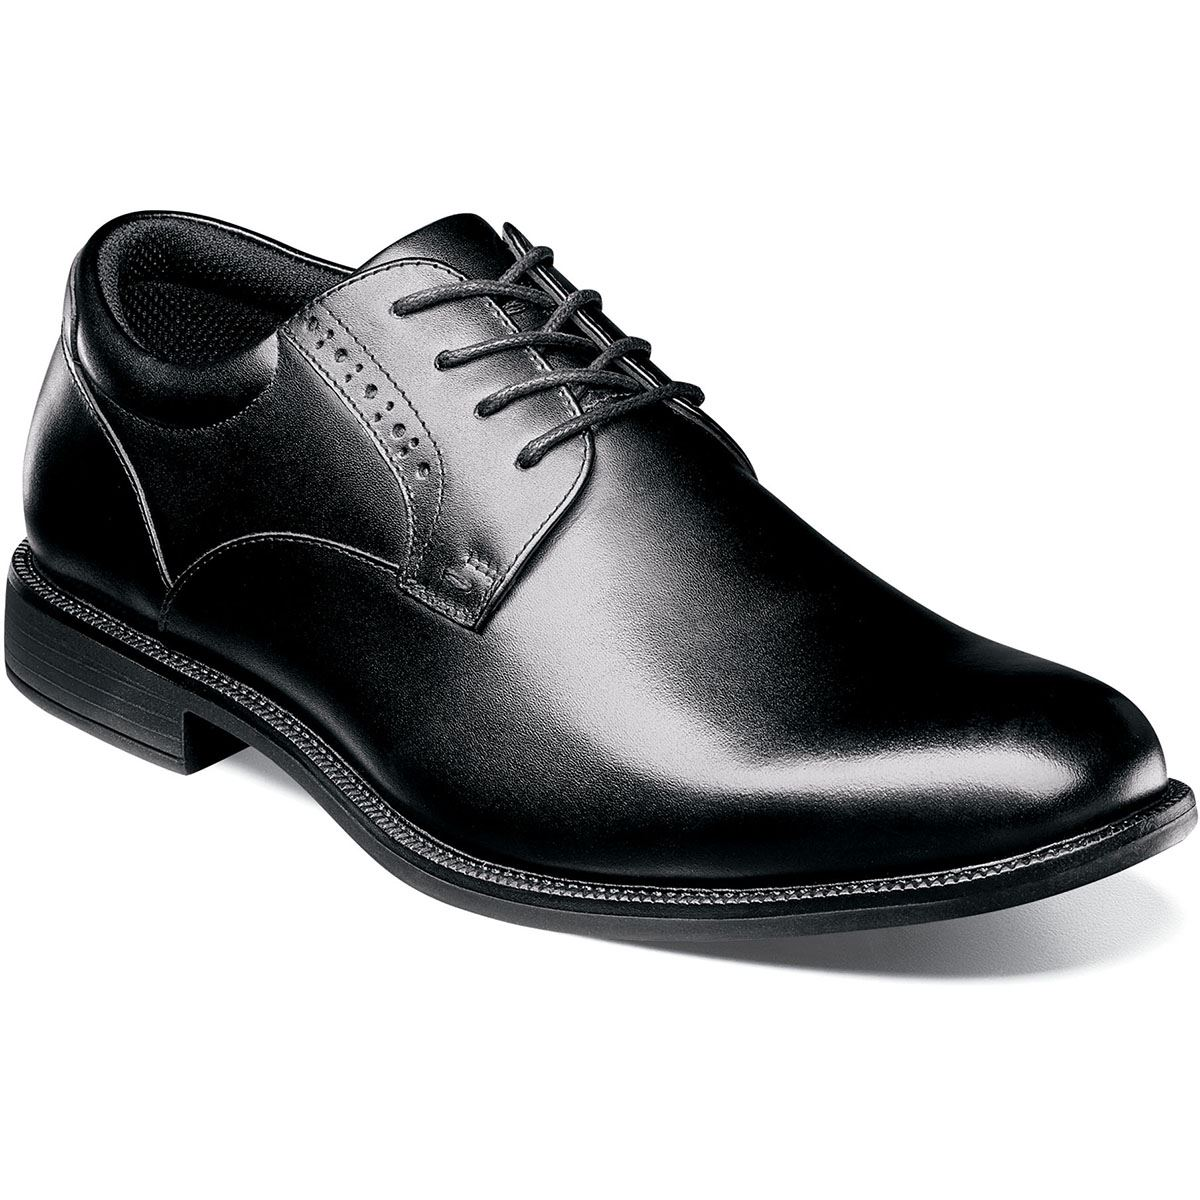 sports shoes ff242 65342 ... Nunn Bush Bush Bush Uomo Nantucket WP Plain Toe Oxford (84770) 41bfe9